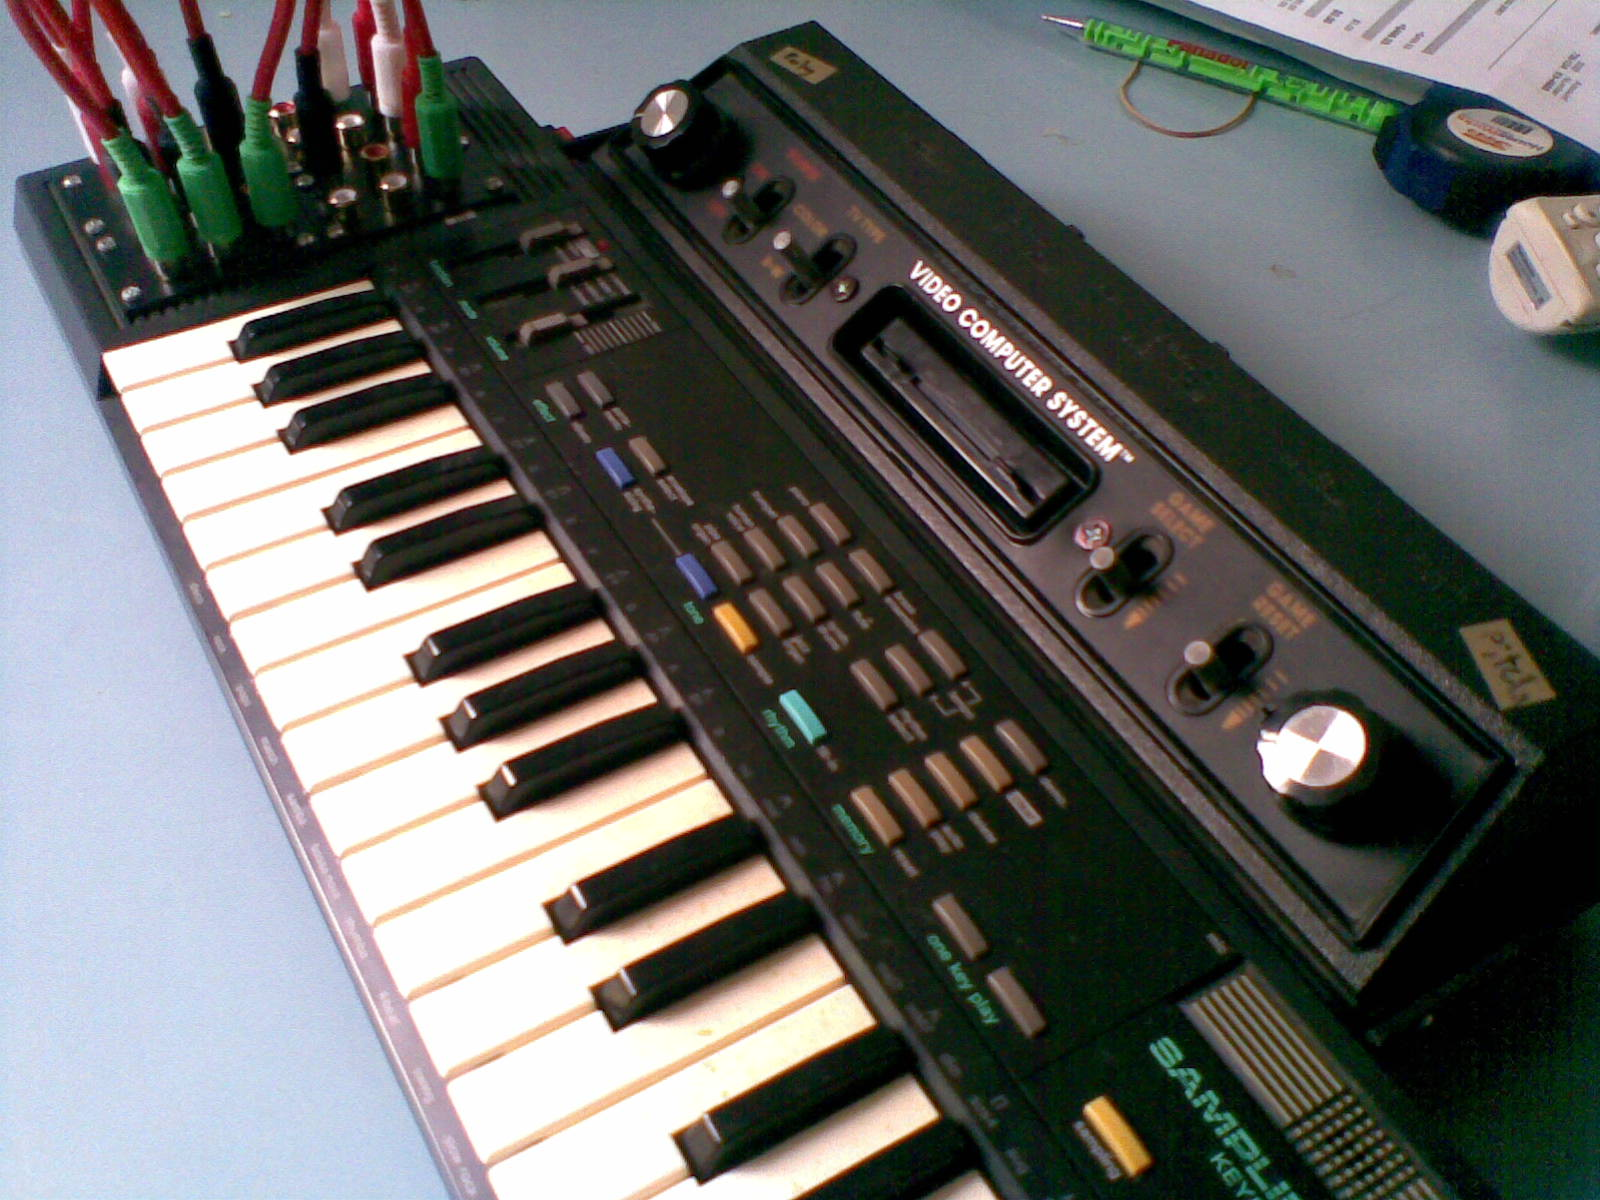 555 Timer Kit Getlofi Circuit Bending Synth Diy